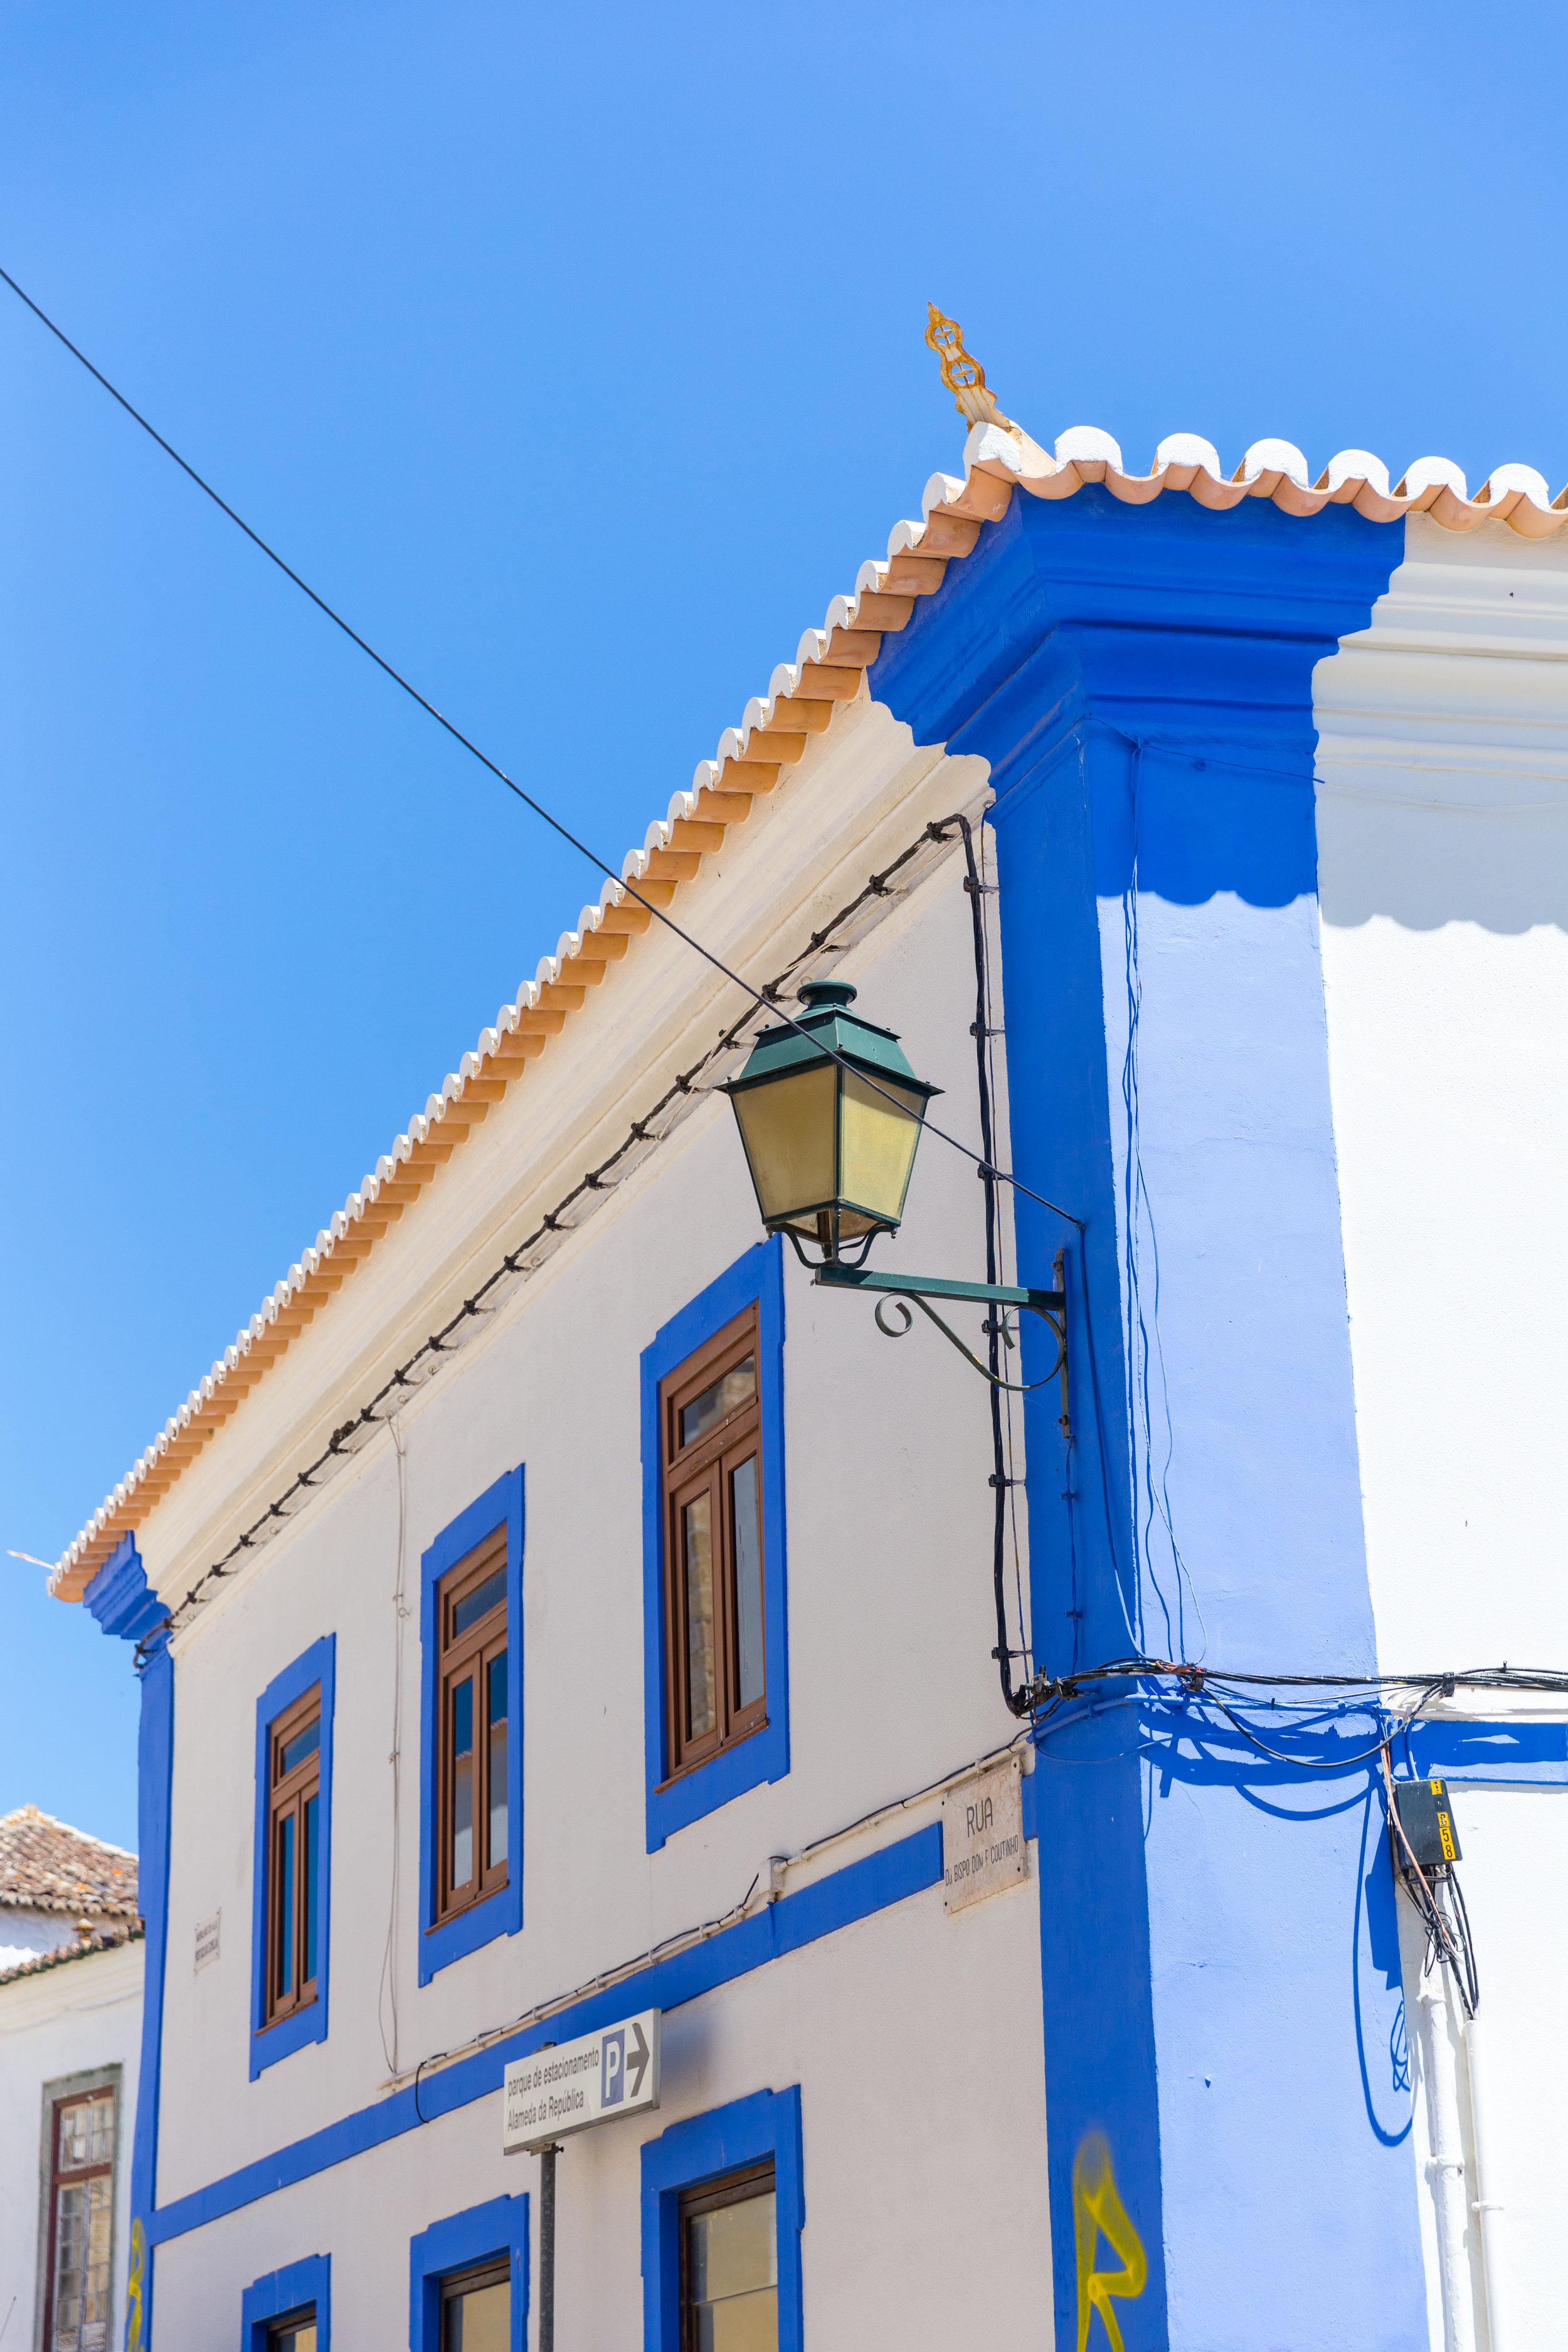 Portugal Algarve Portimao Summer Travel-3.jpg